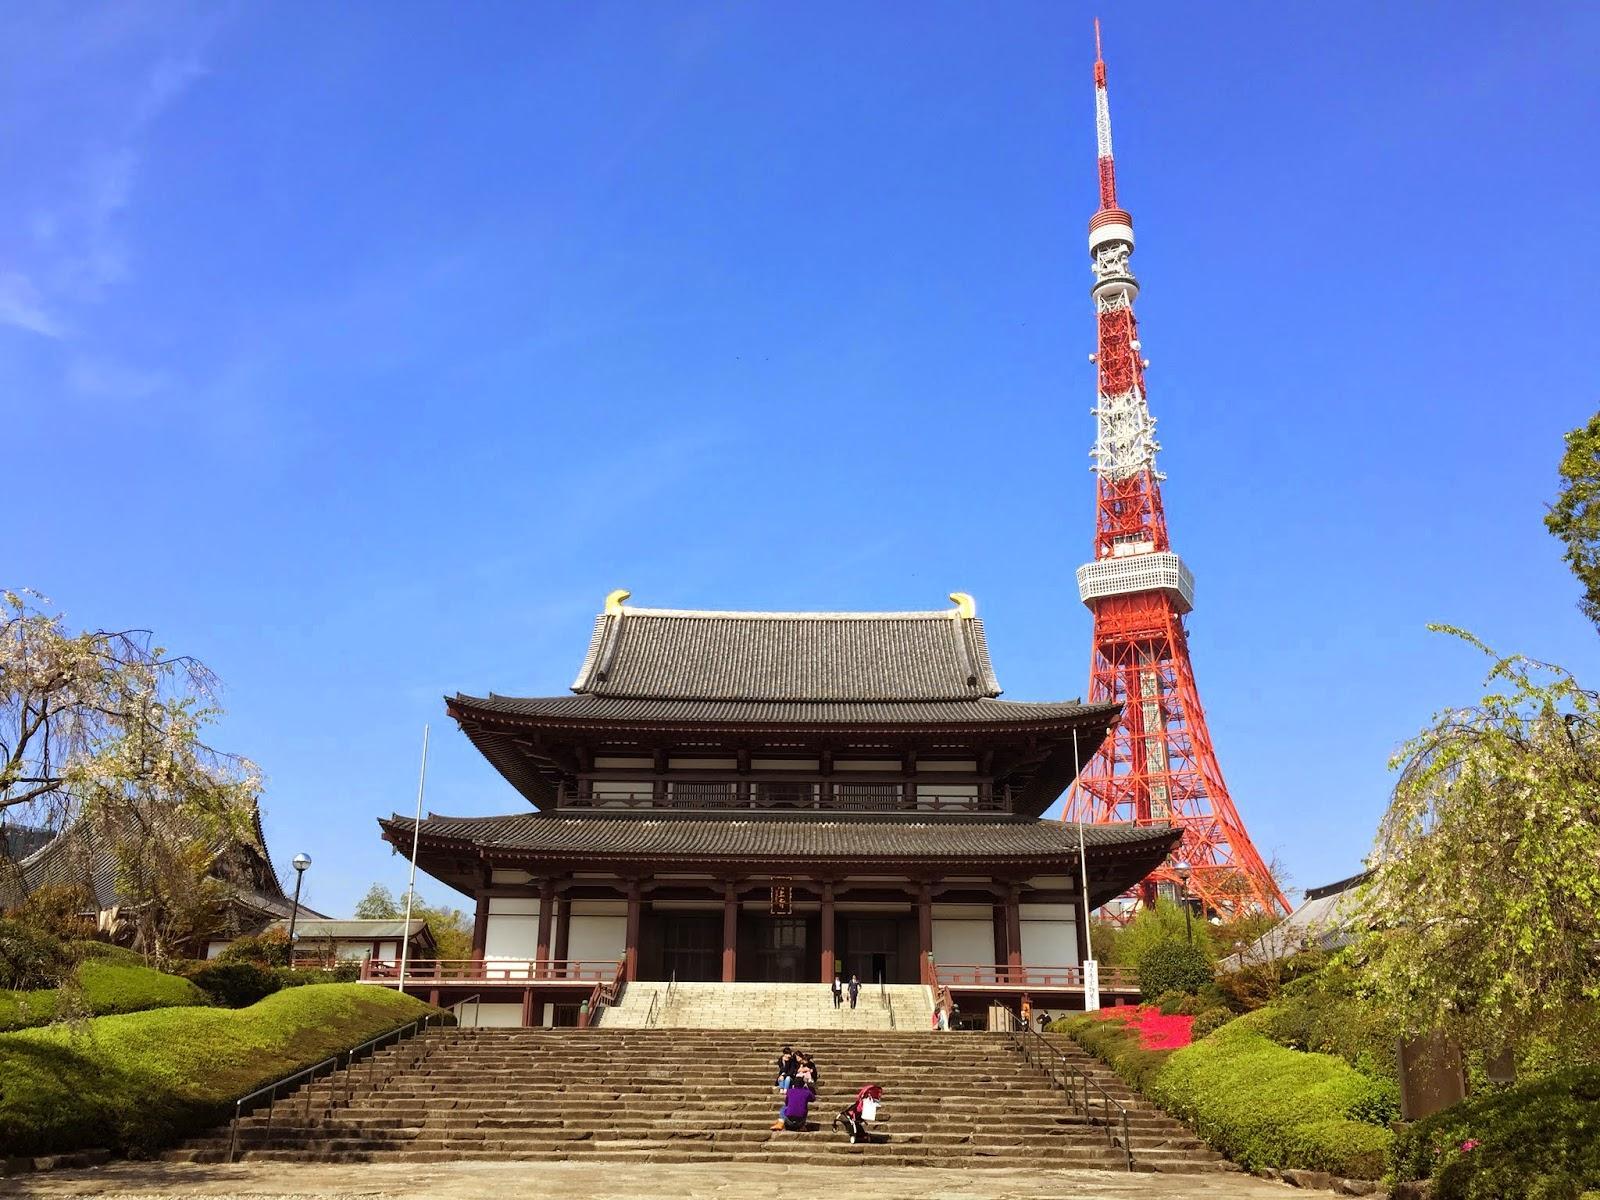 tokyo tower photos